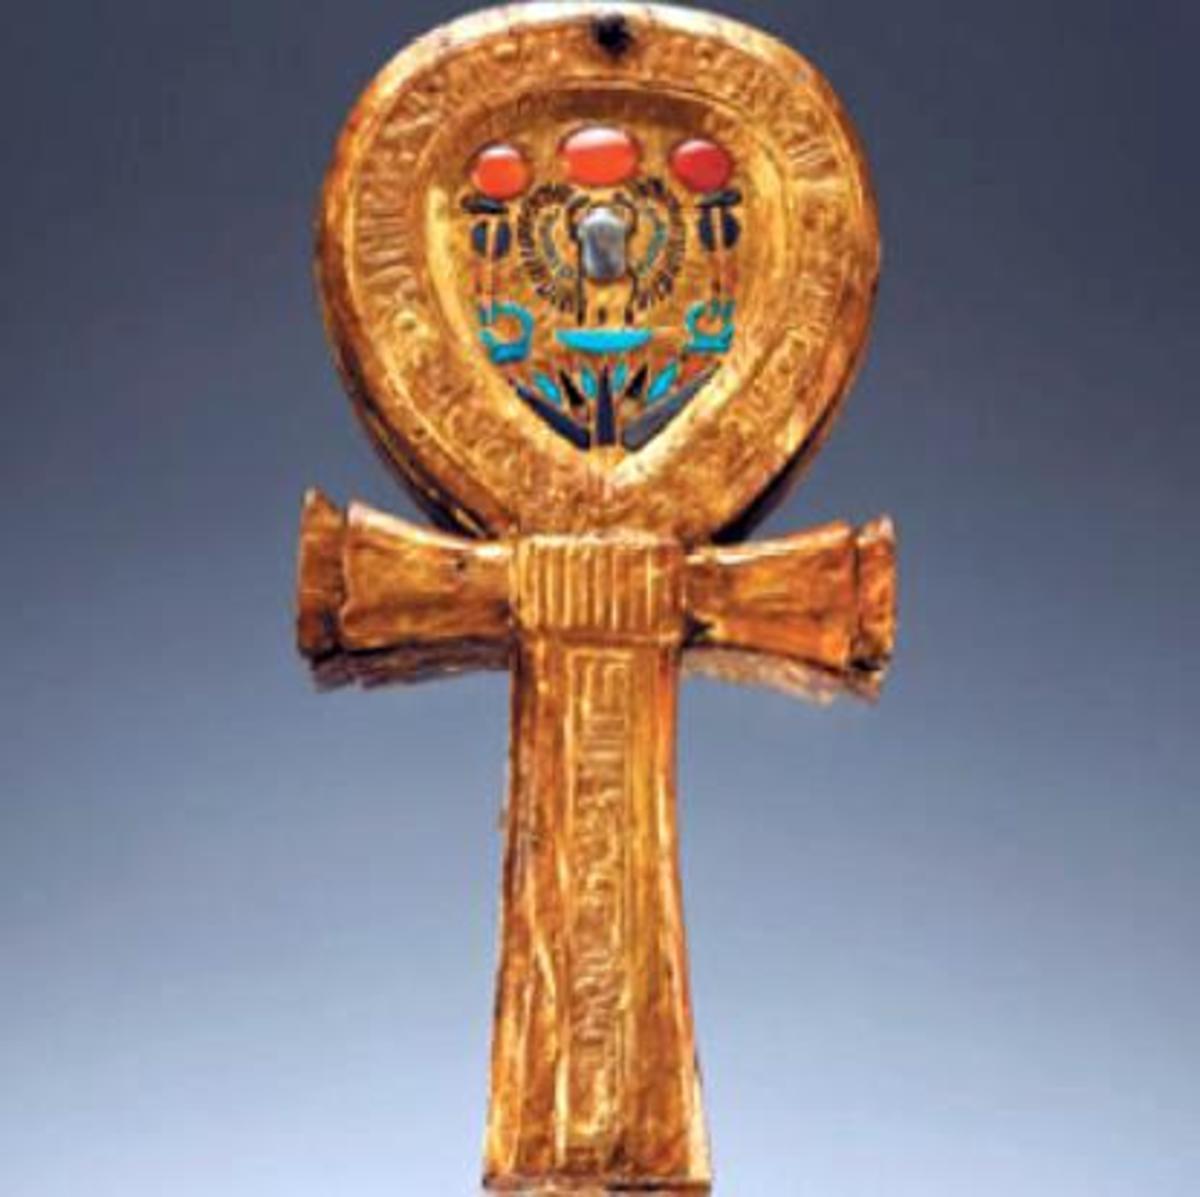 Ankh Mirror from the tomb of Tutankhamen